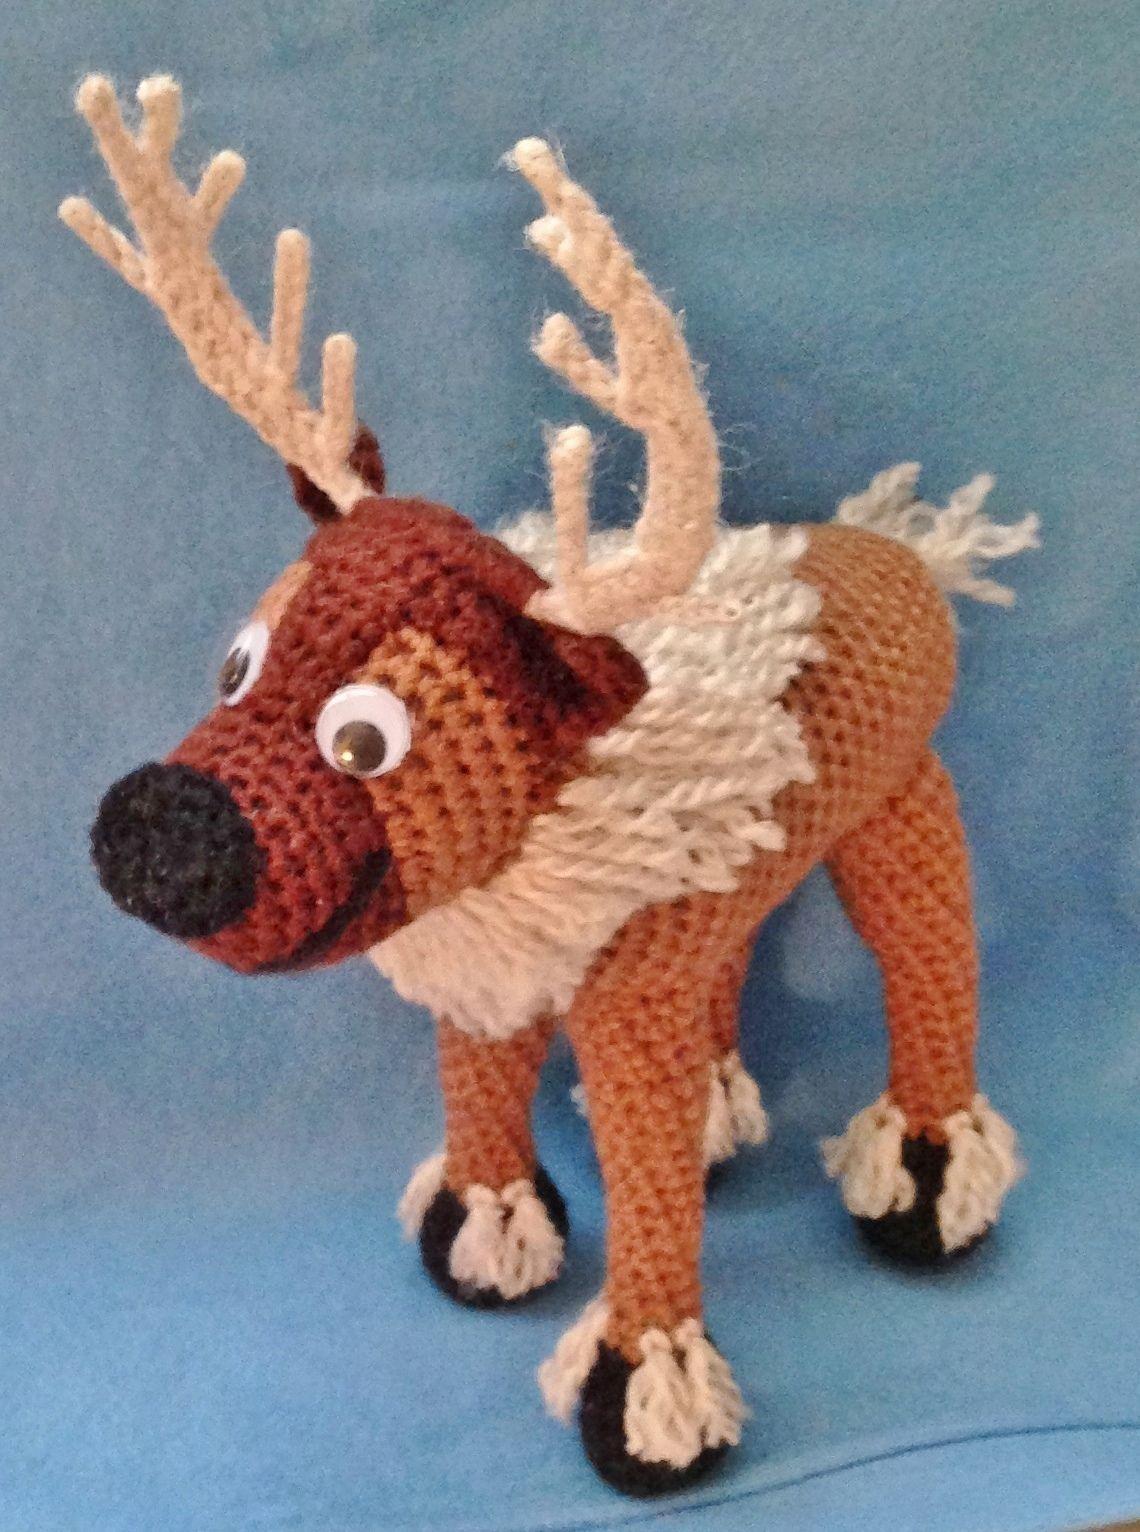 Ravelry: Crocheted Reindeer, based on \